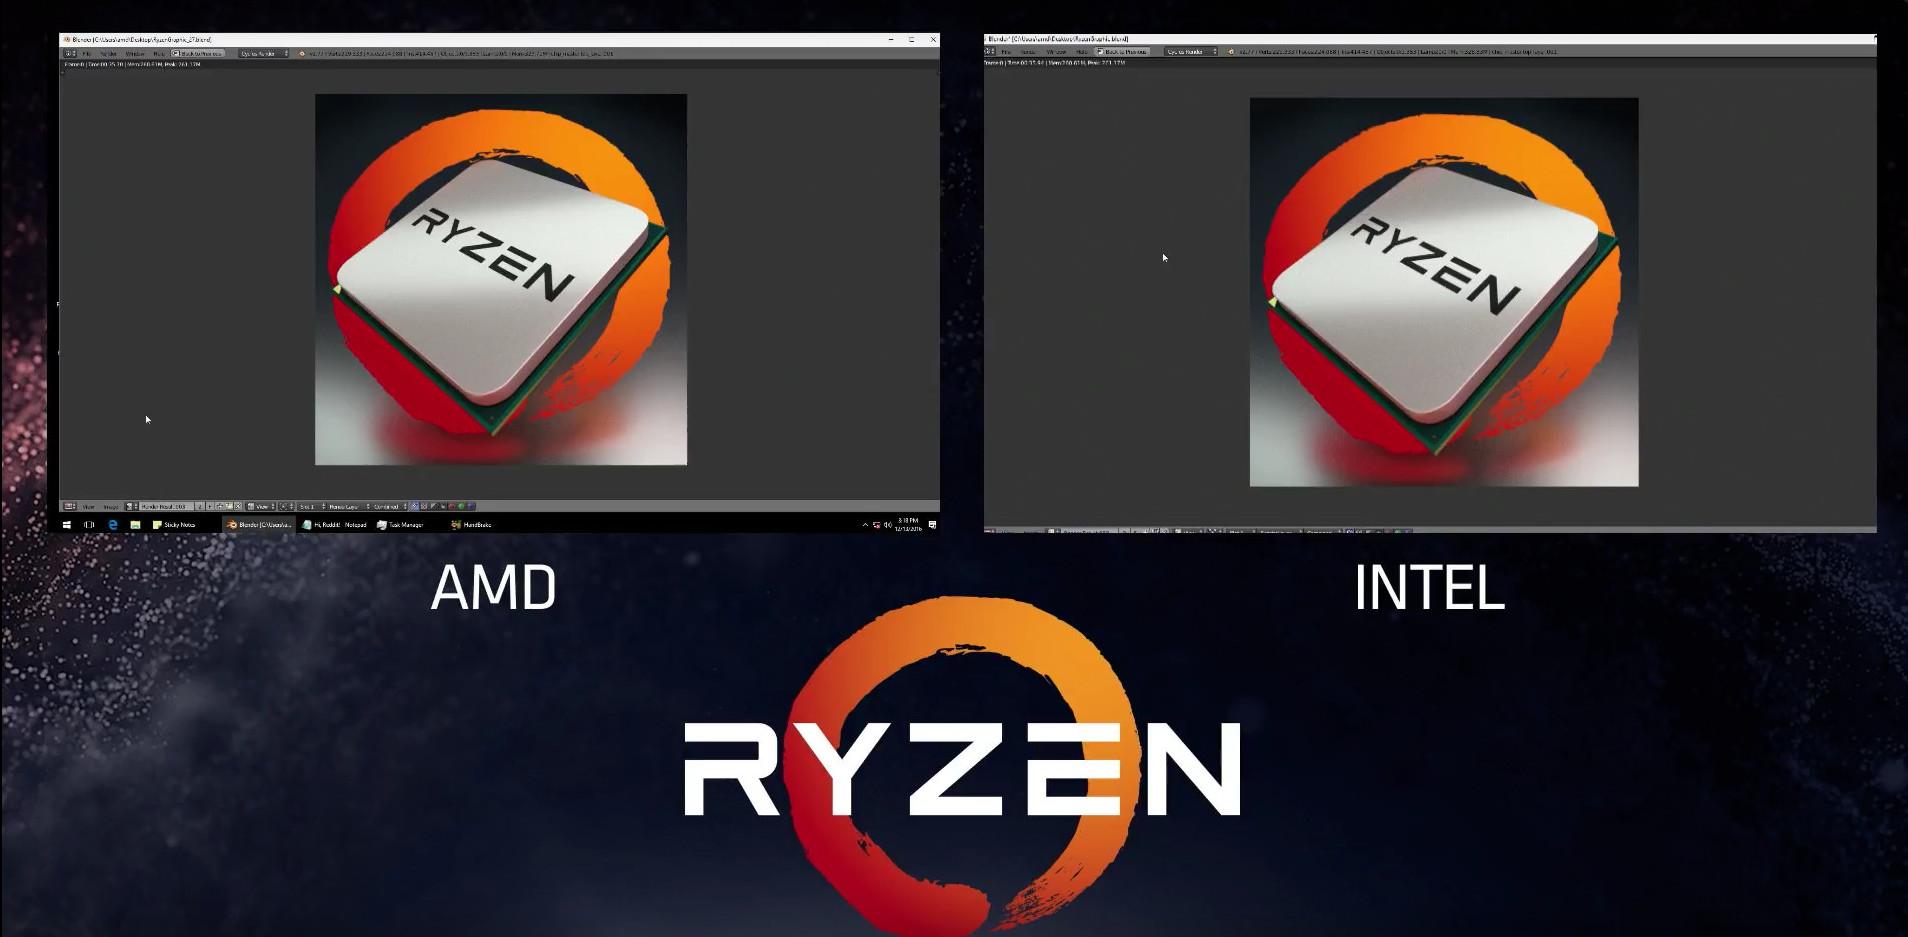 Amd Ryzen Demo Event Beats 1 100 8 Core I7 6900k With Lower Tdp Techpowerup